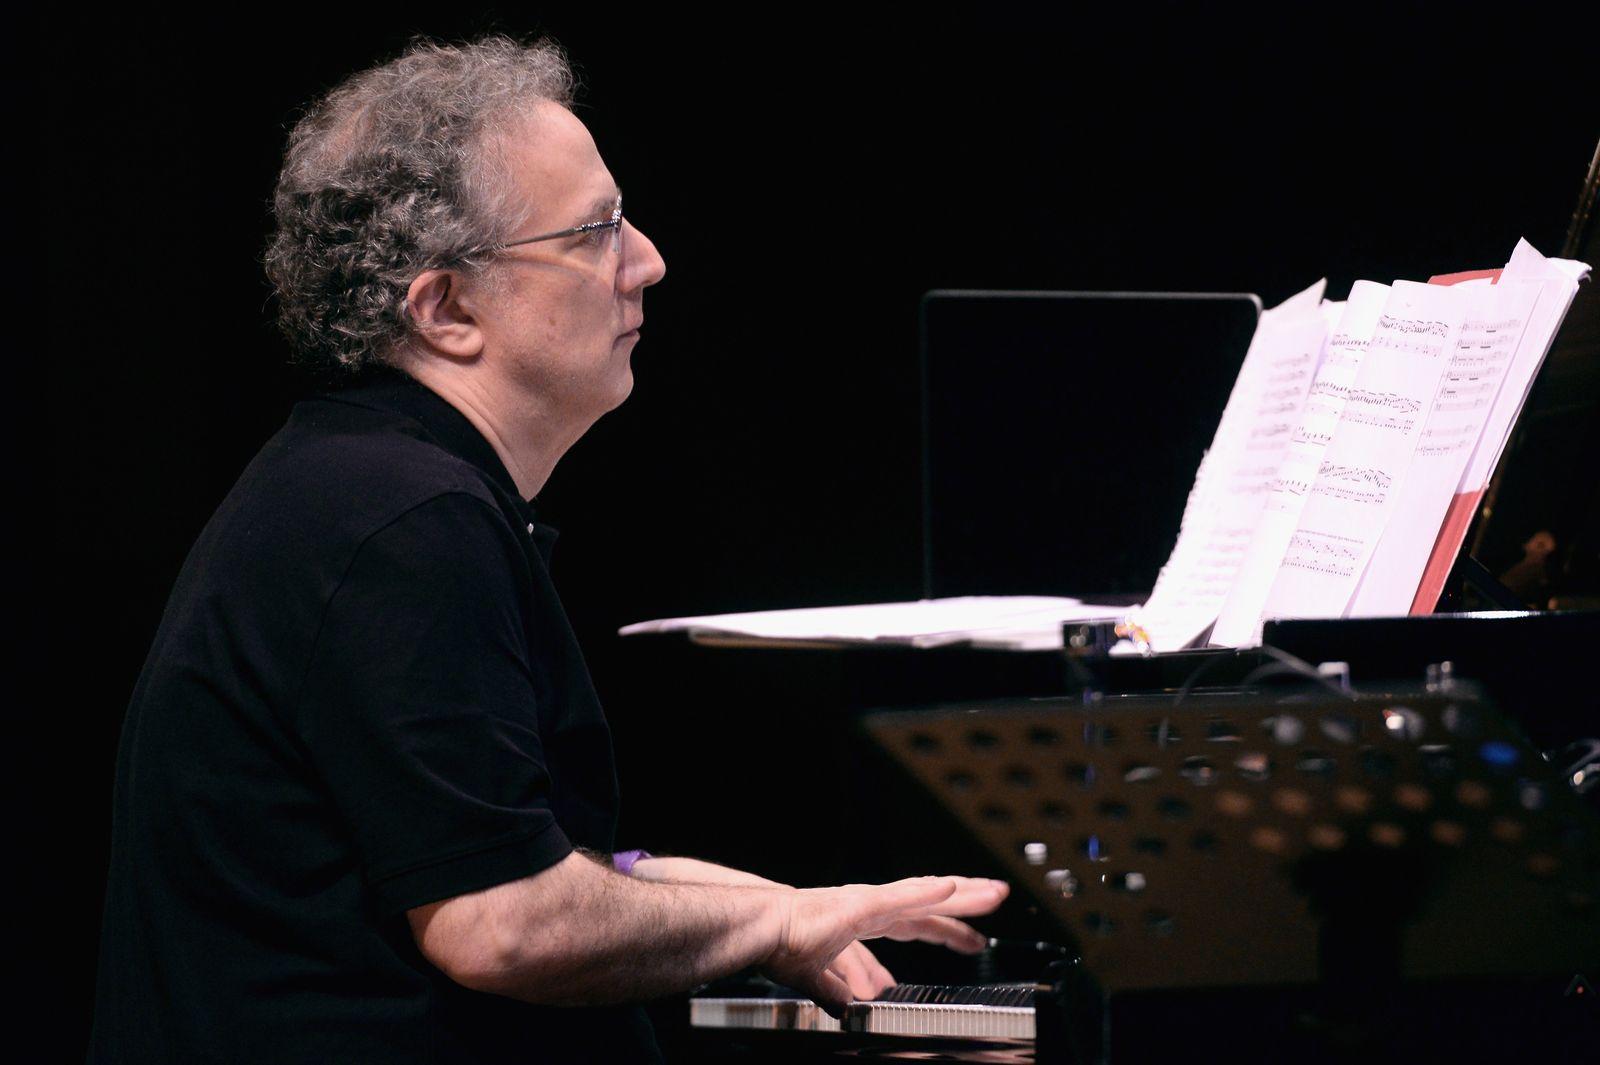 Uri Caine Ensamble Plays Gershwin In Bologna